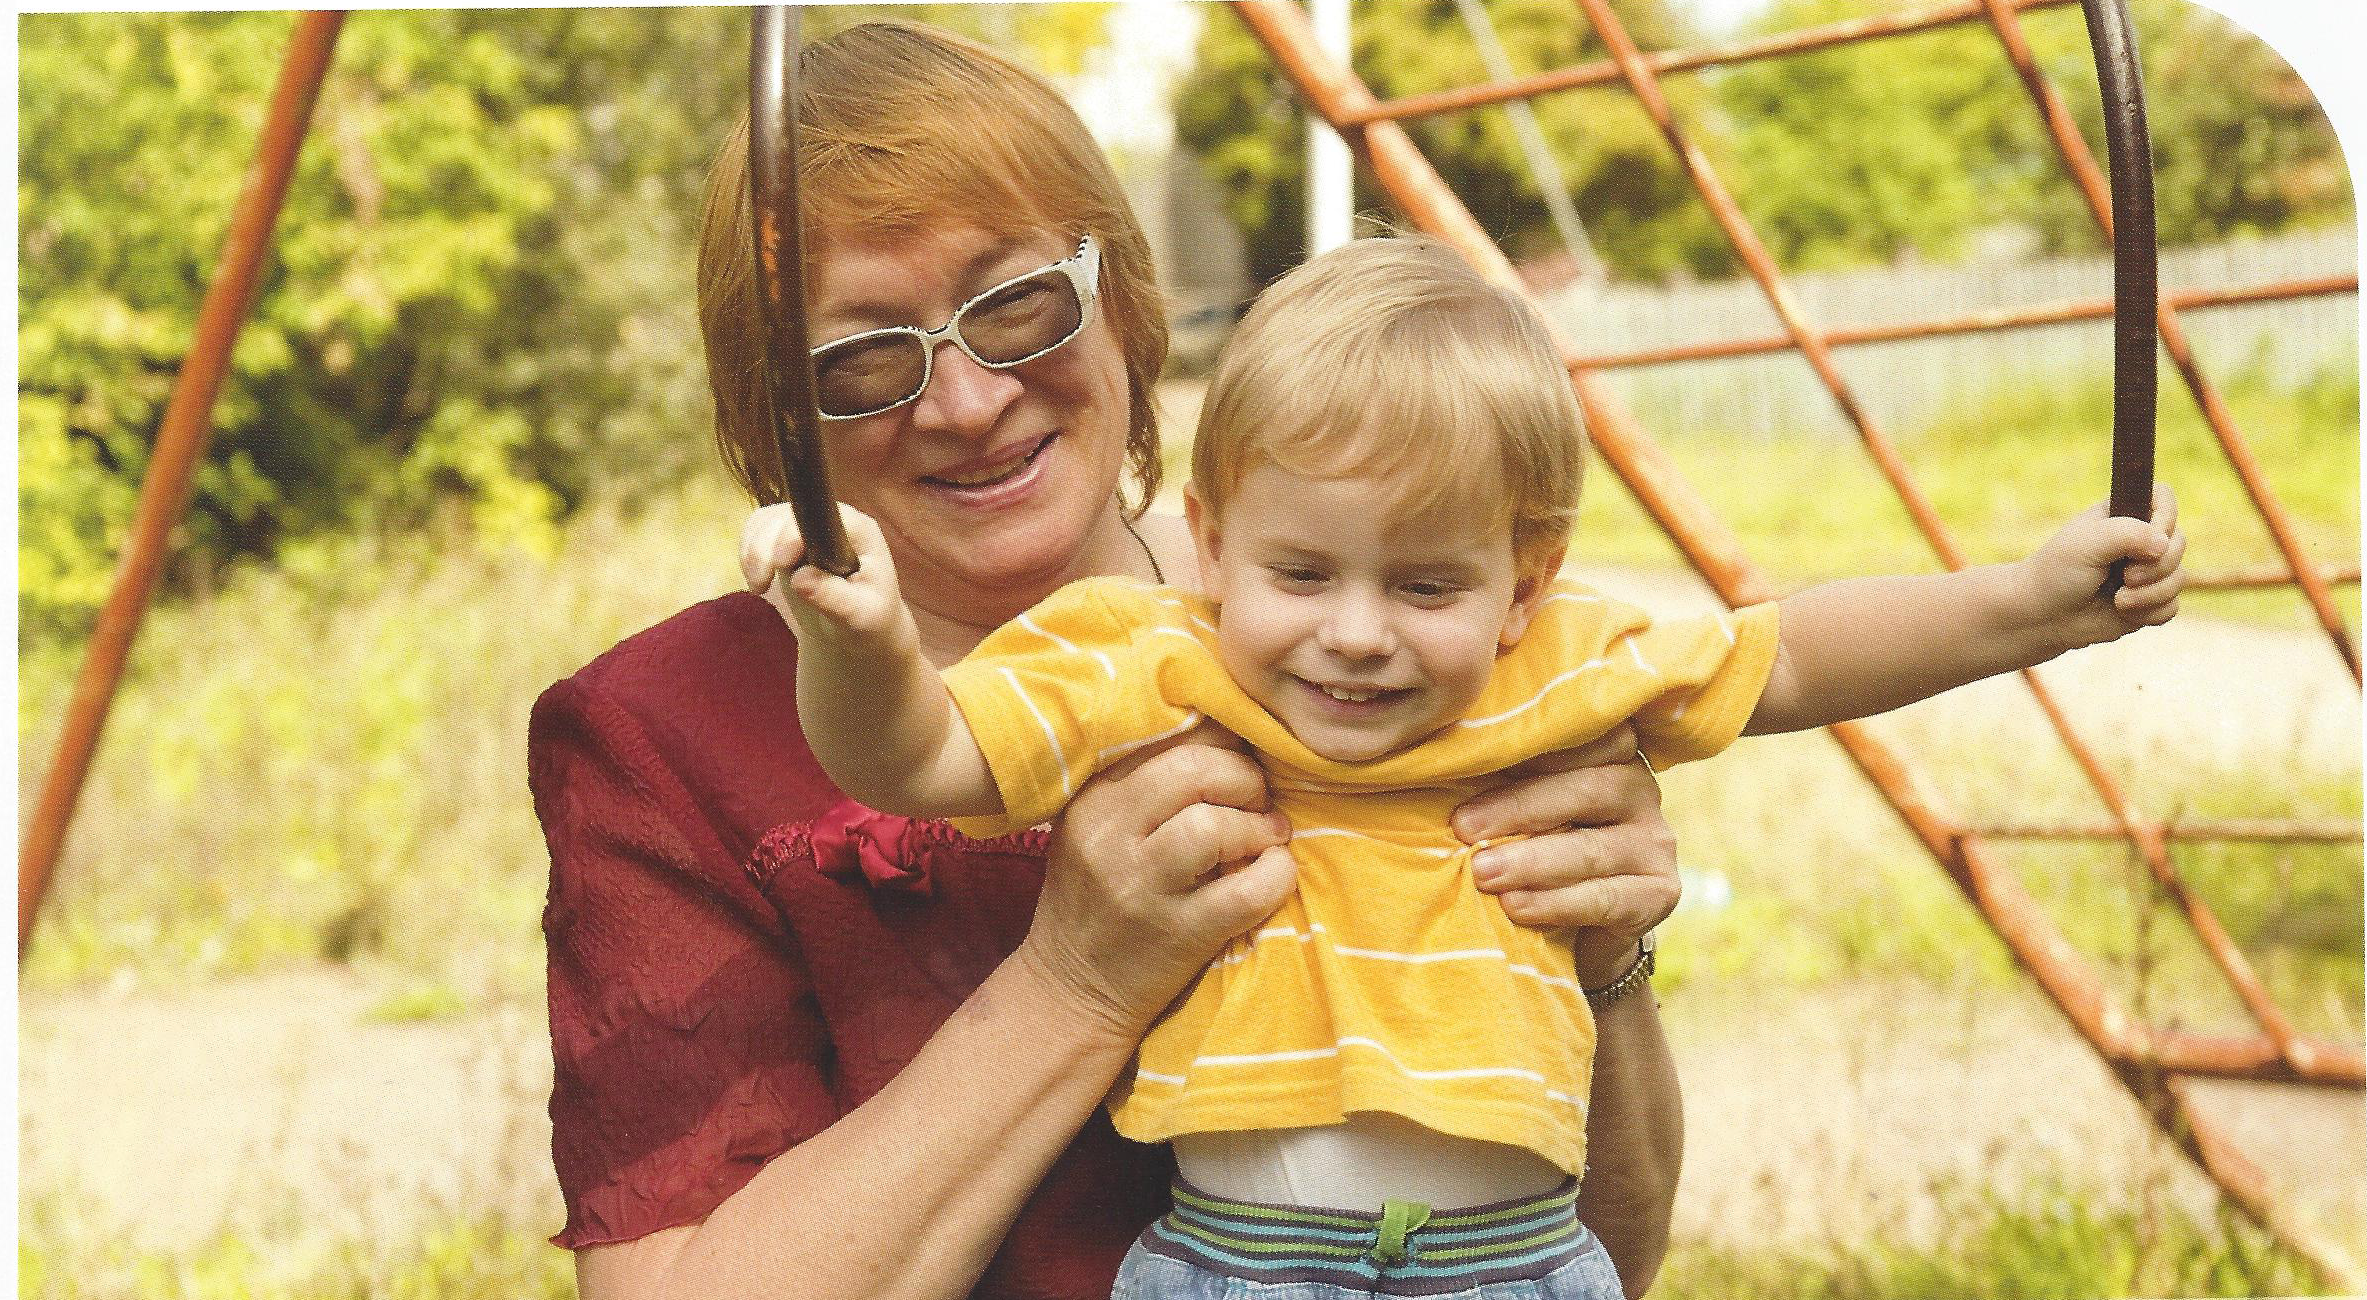 Сех бабушка с вунукам 2 фотография